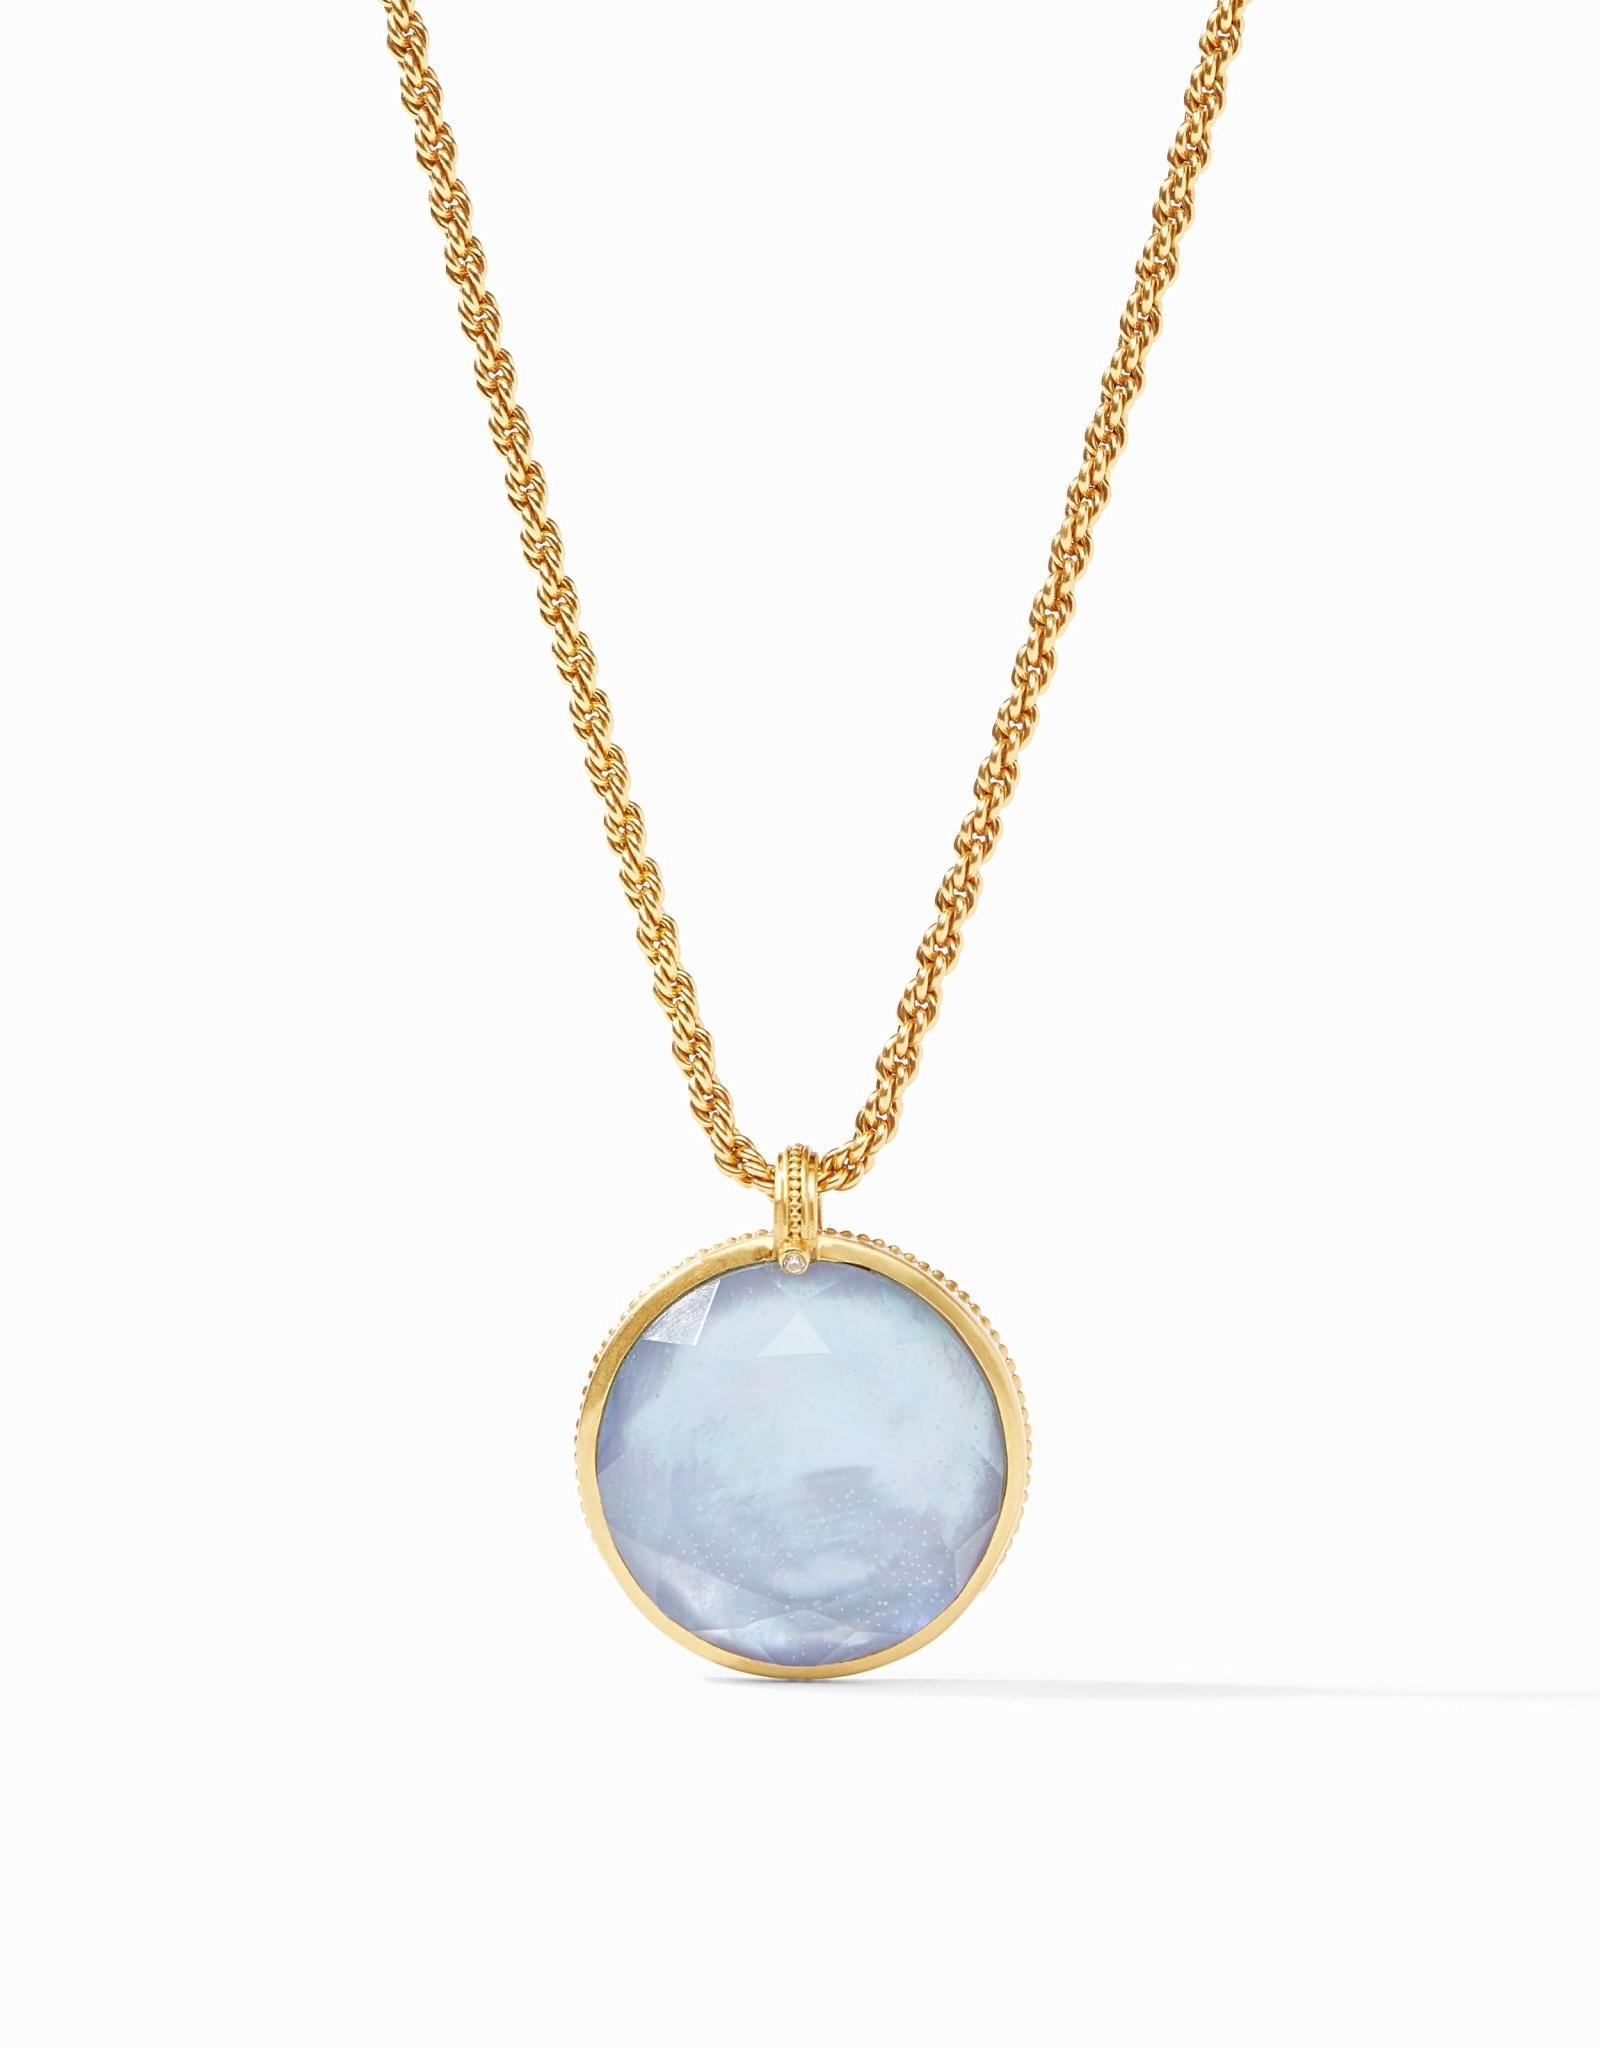 Julie Vos Coin Statement Pendant Gold Iridescent Iridescent Blue